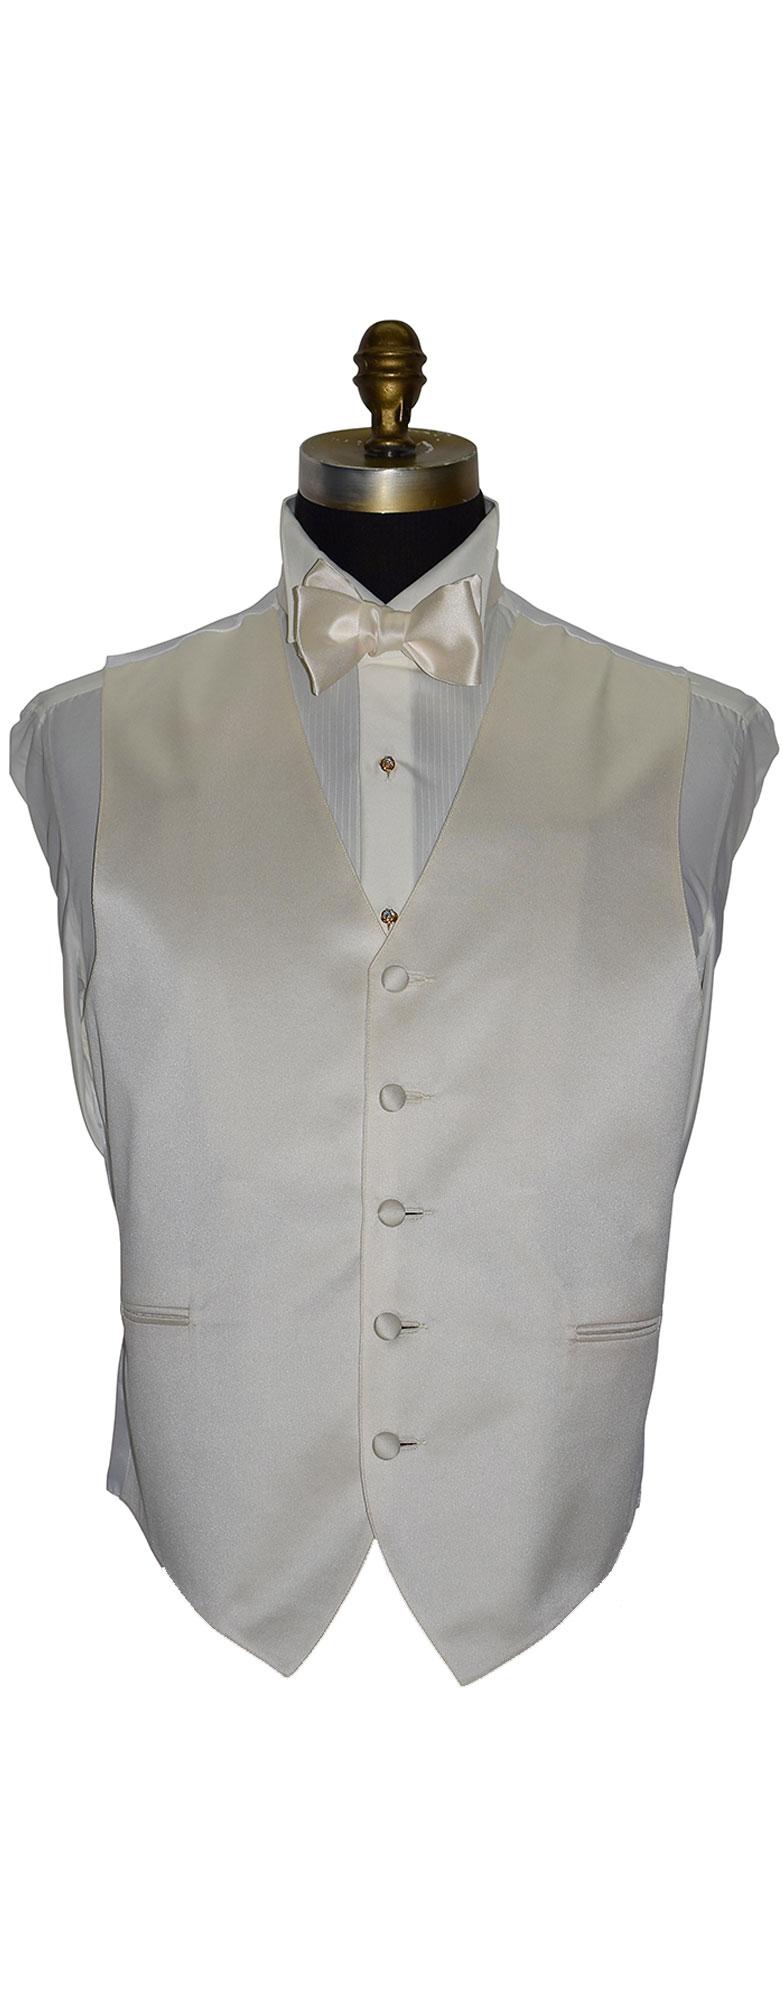 Ivory Off White Satin Tuxedo Vest